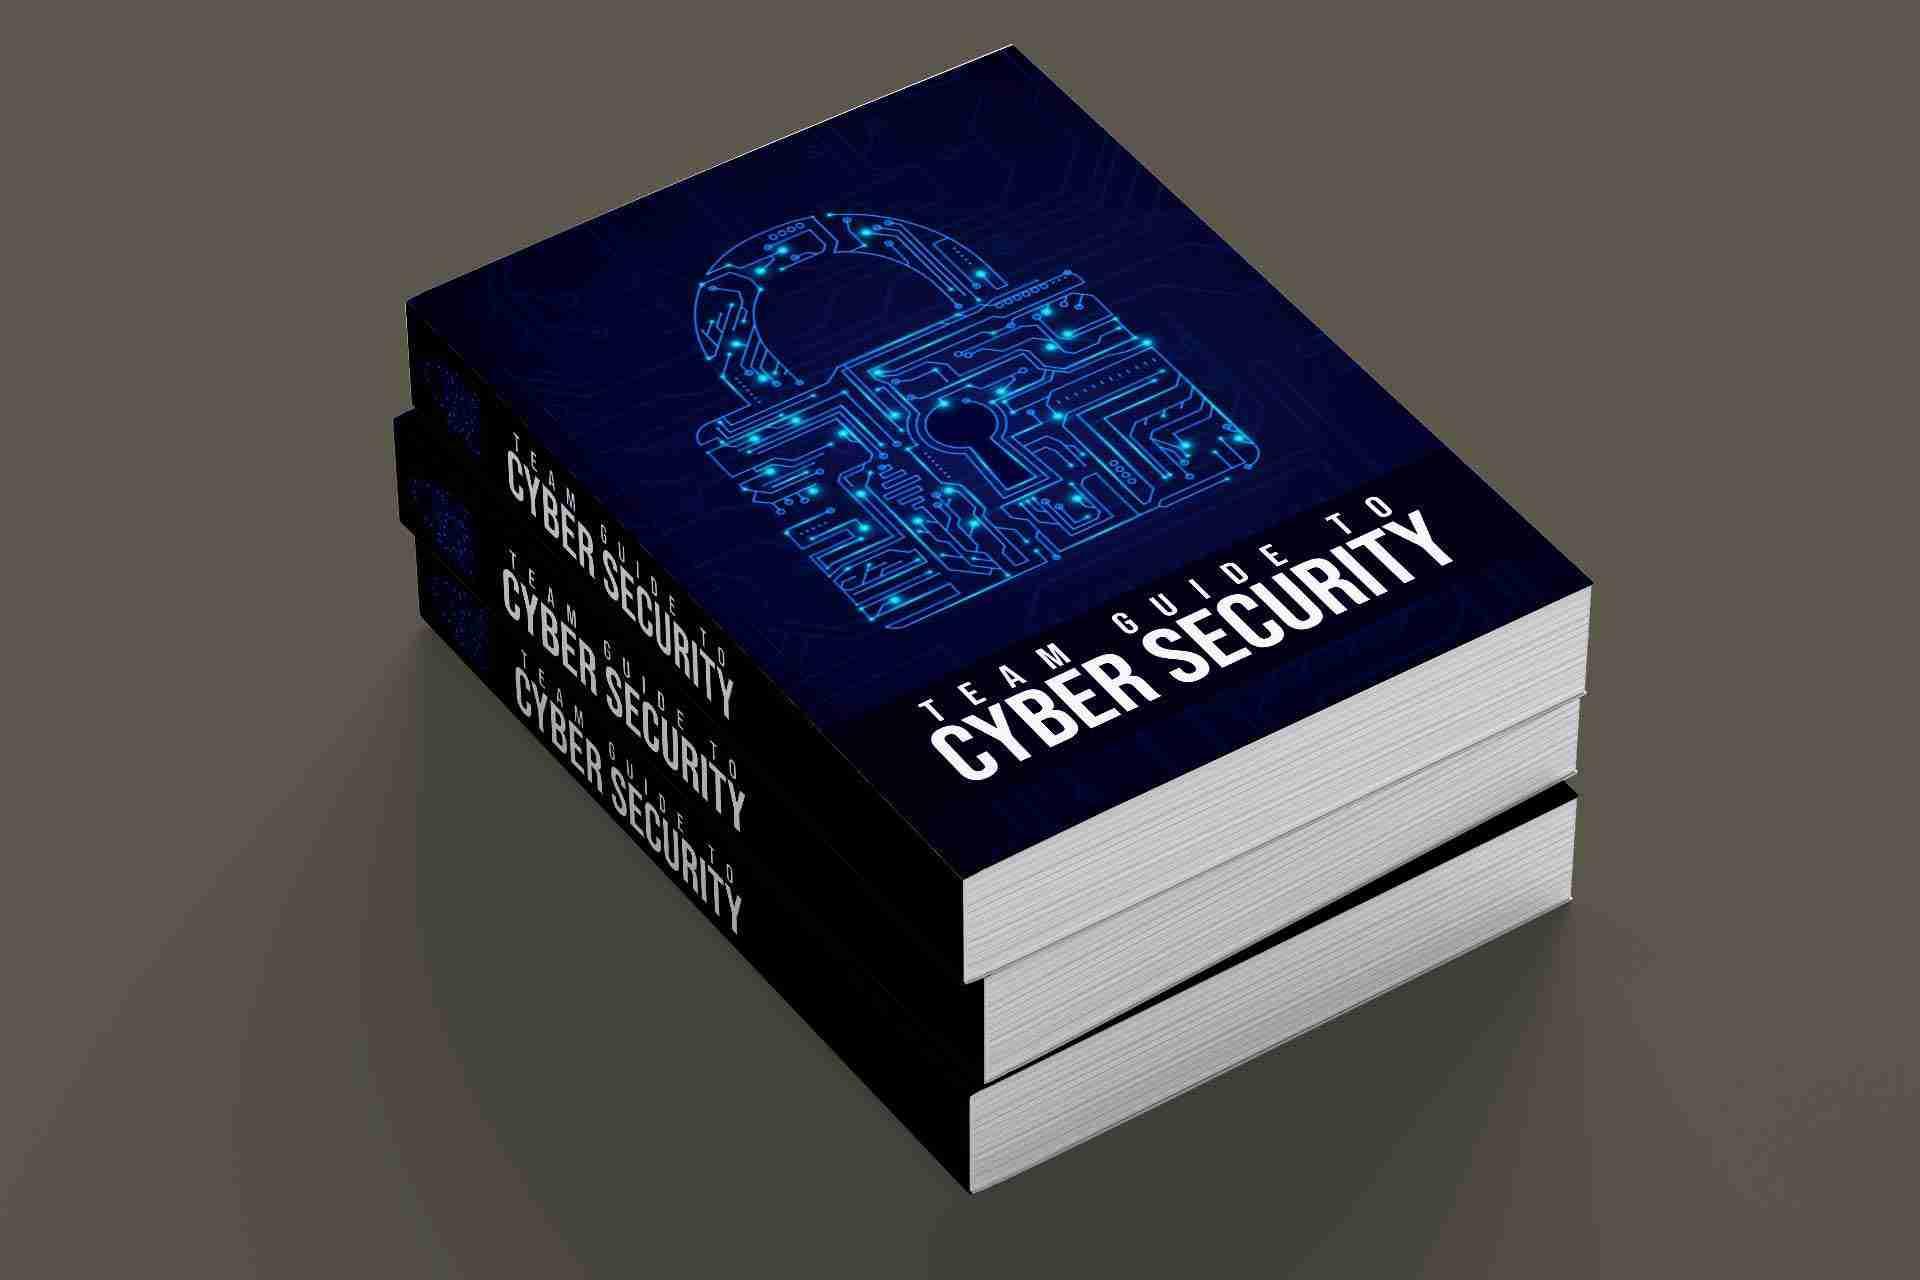 Cyber-Security-Book-getitprinted.com